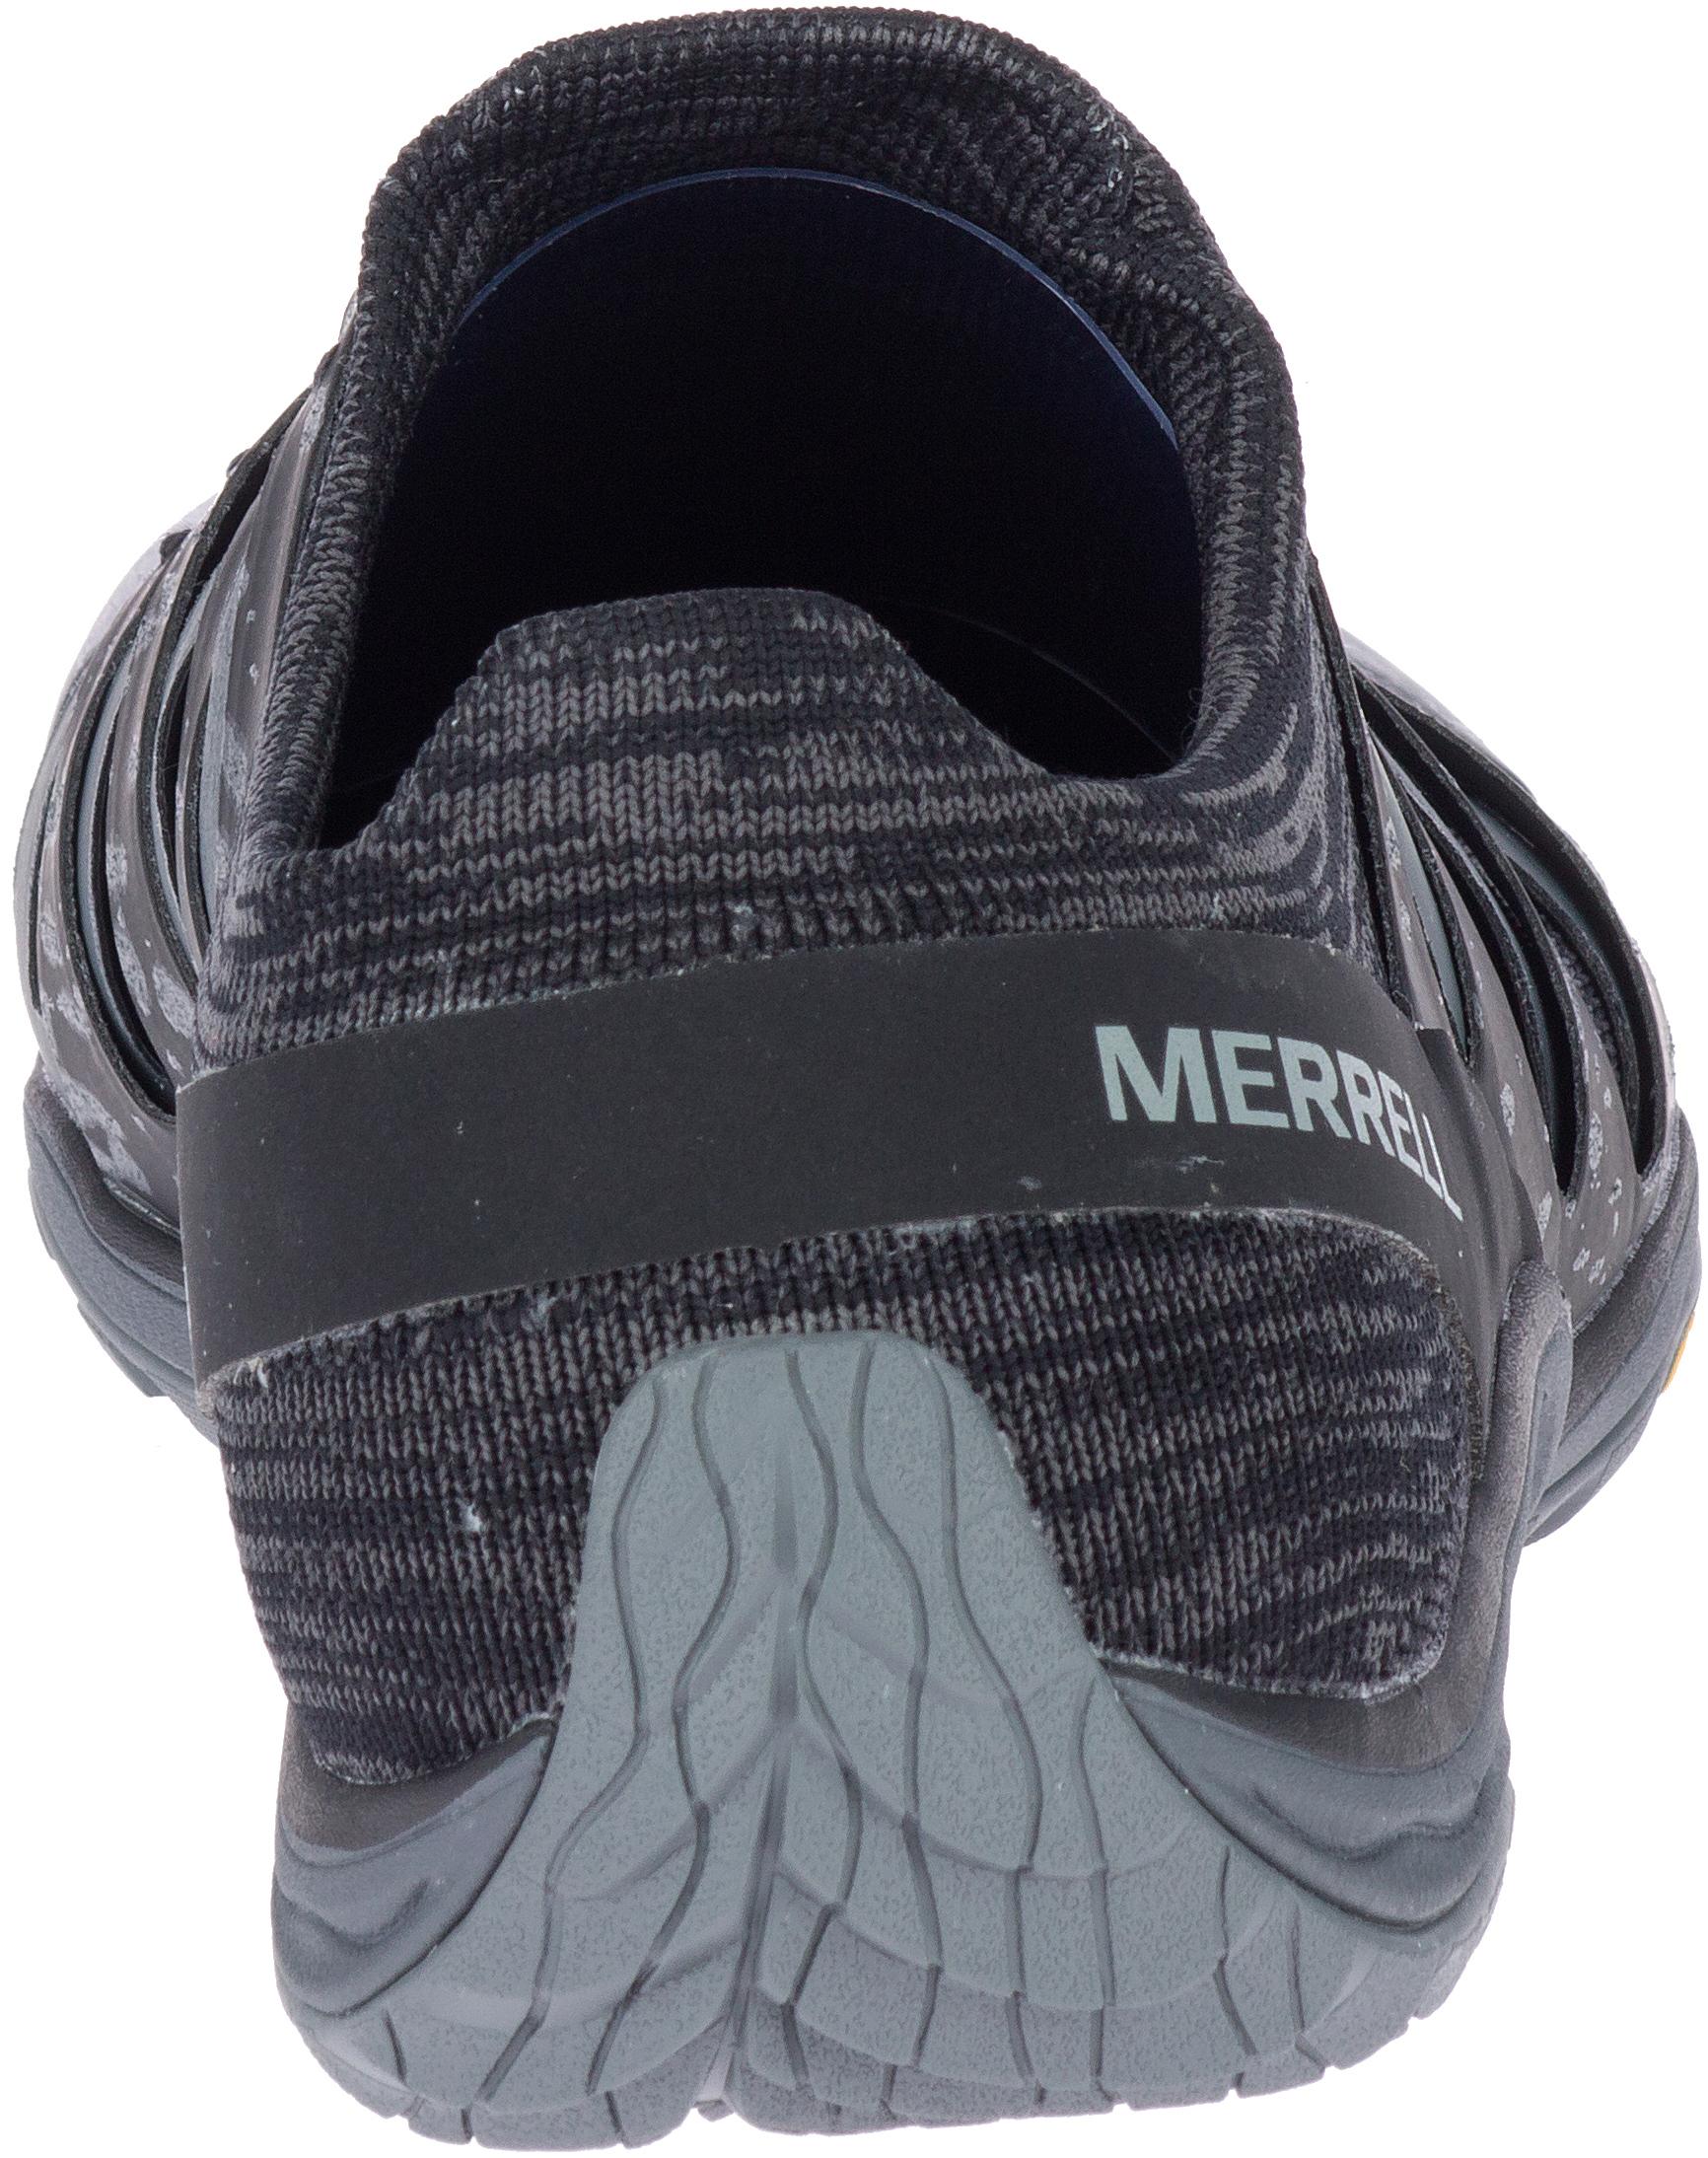 merrell trail glove 5 3d womens canada